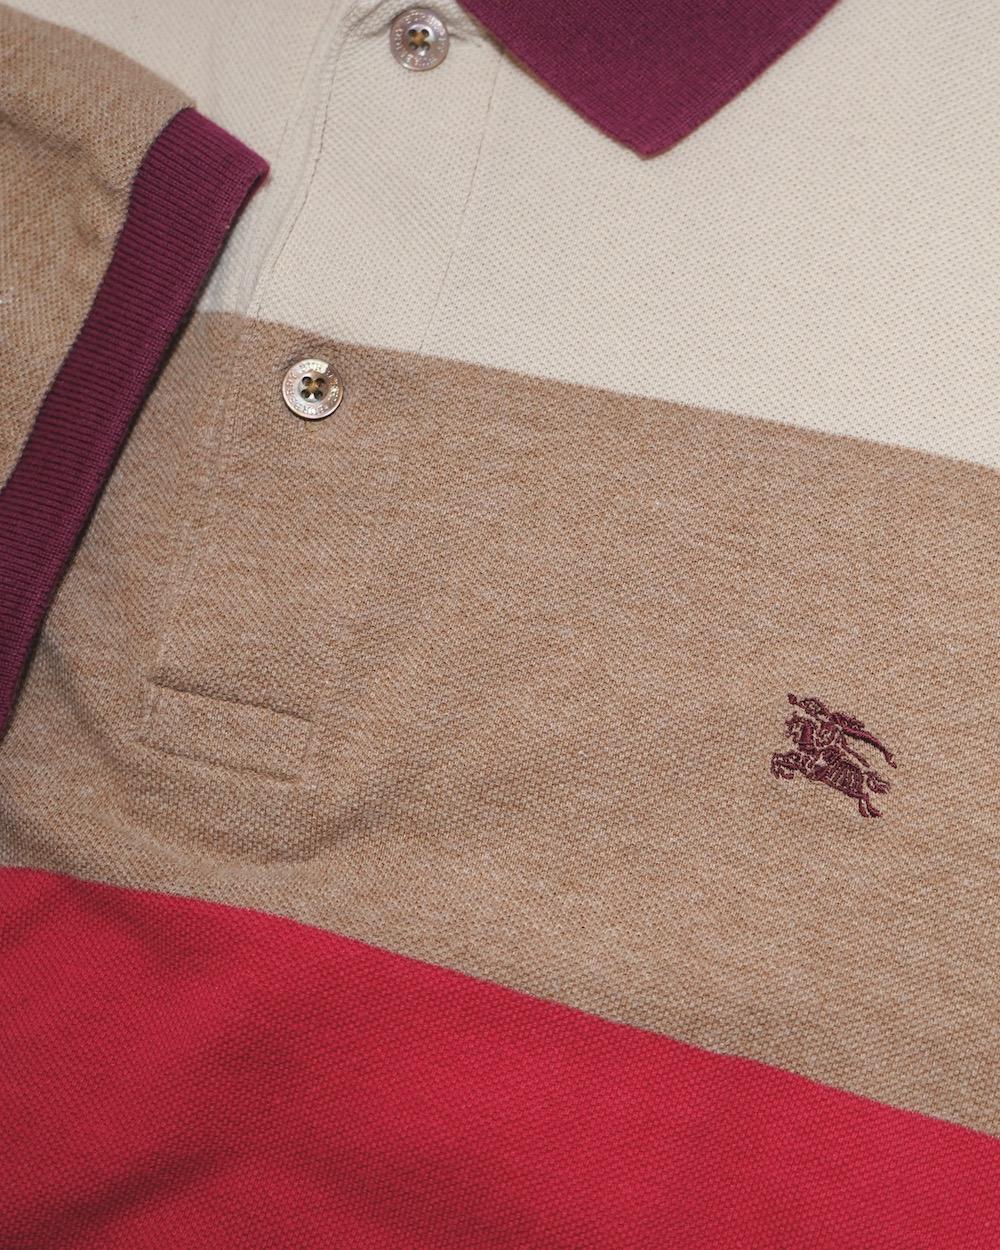 """BURBERRY LONDON"" 1P Logo Multi Color Border Polo Shirts"